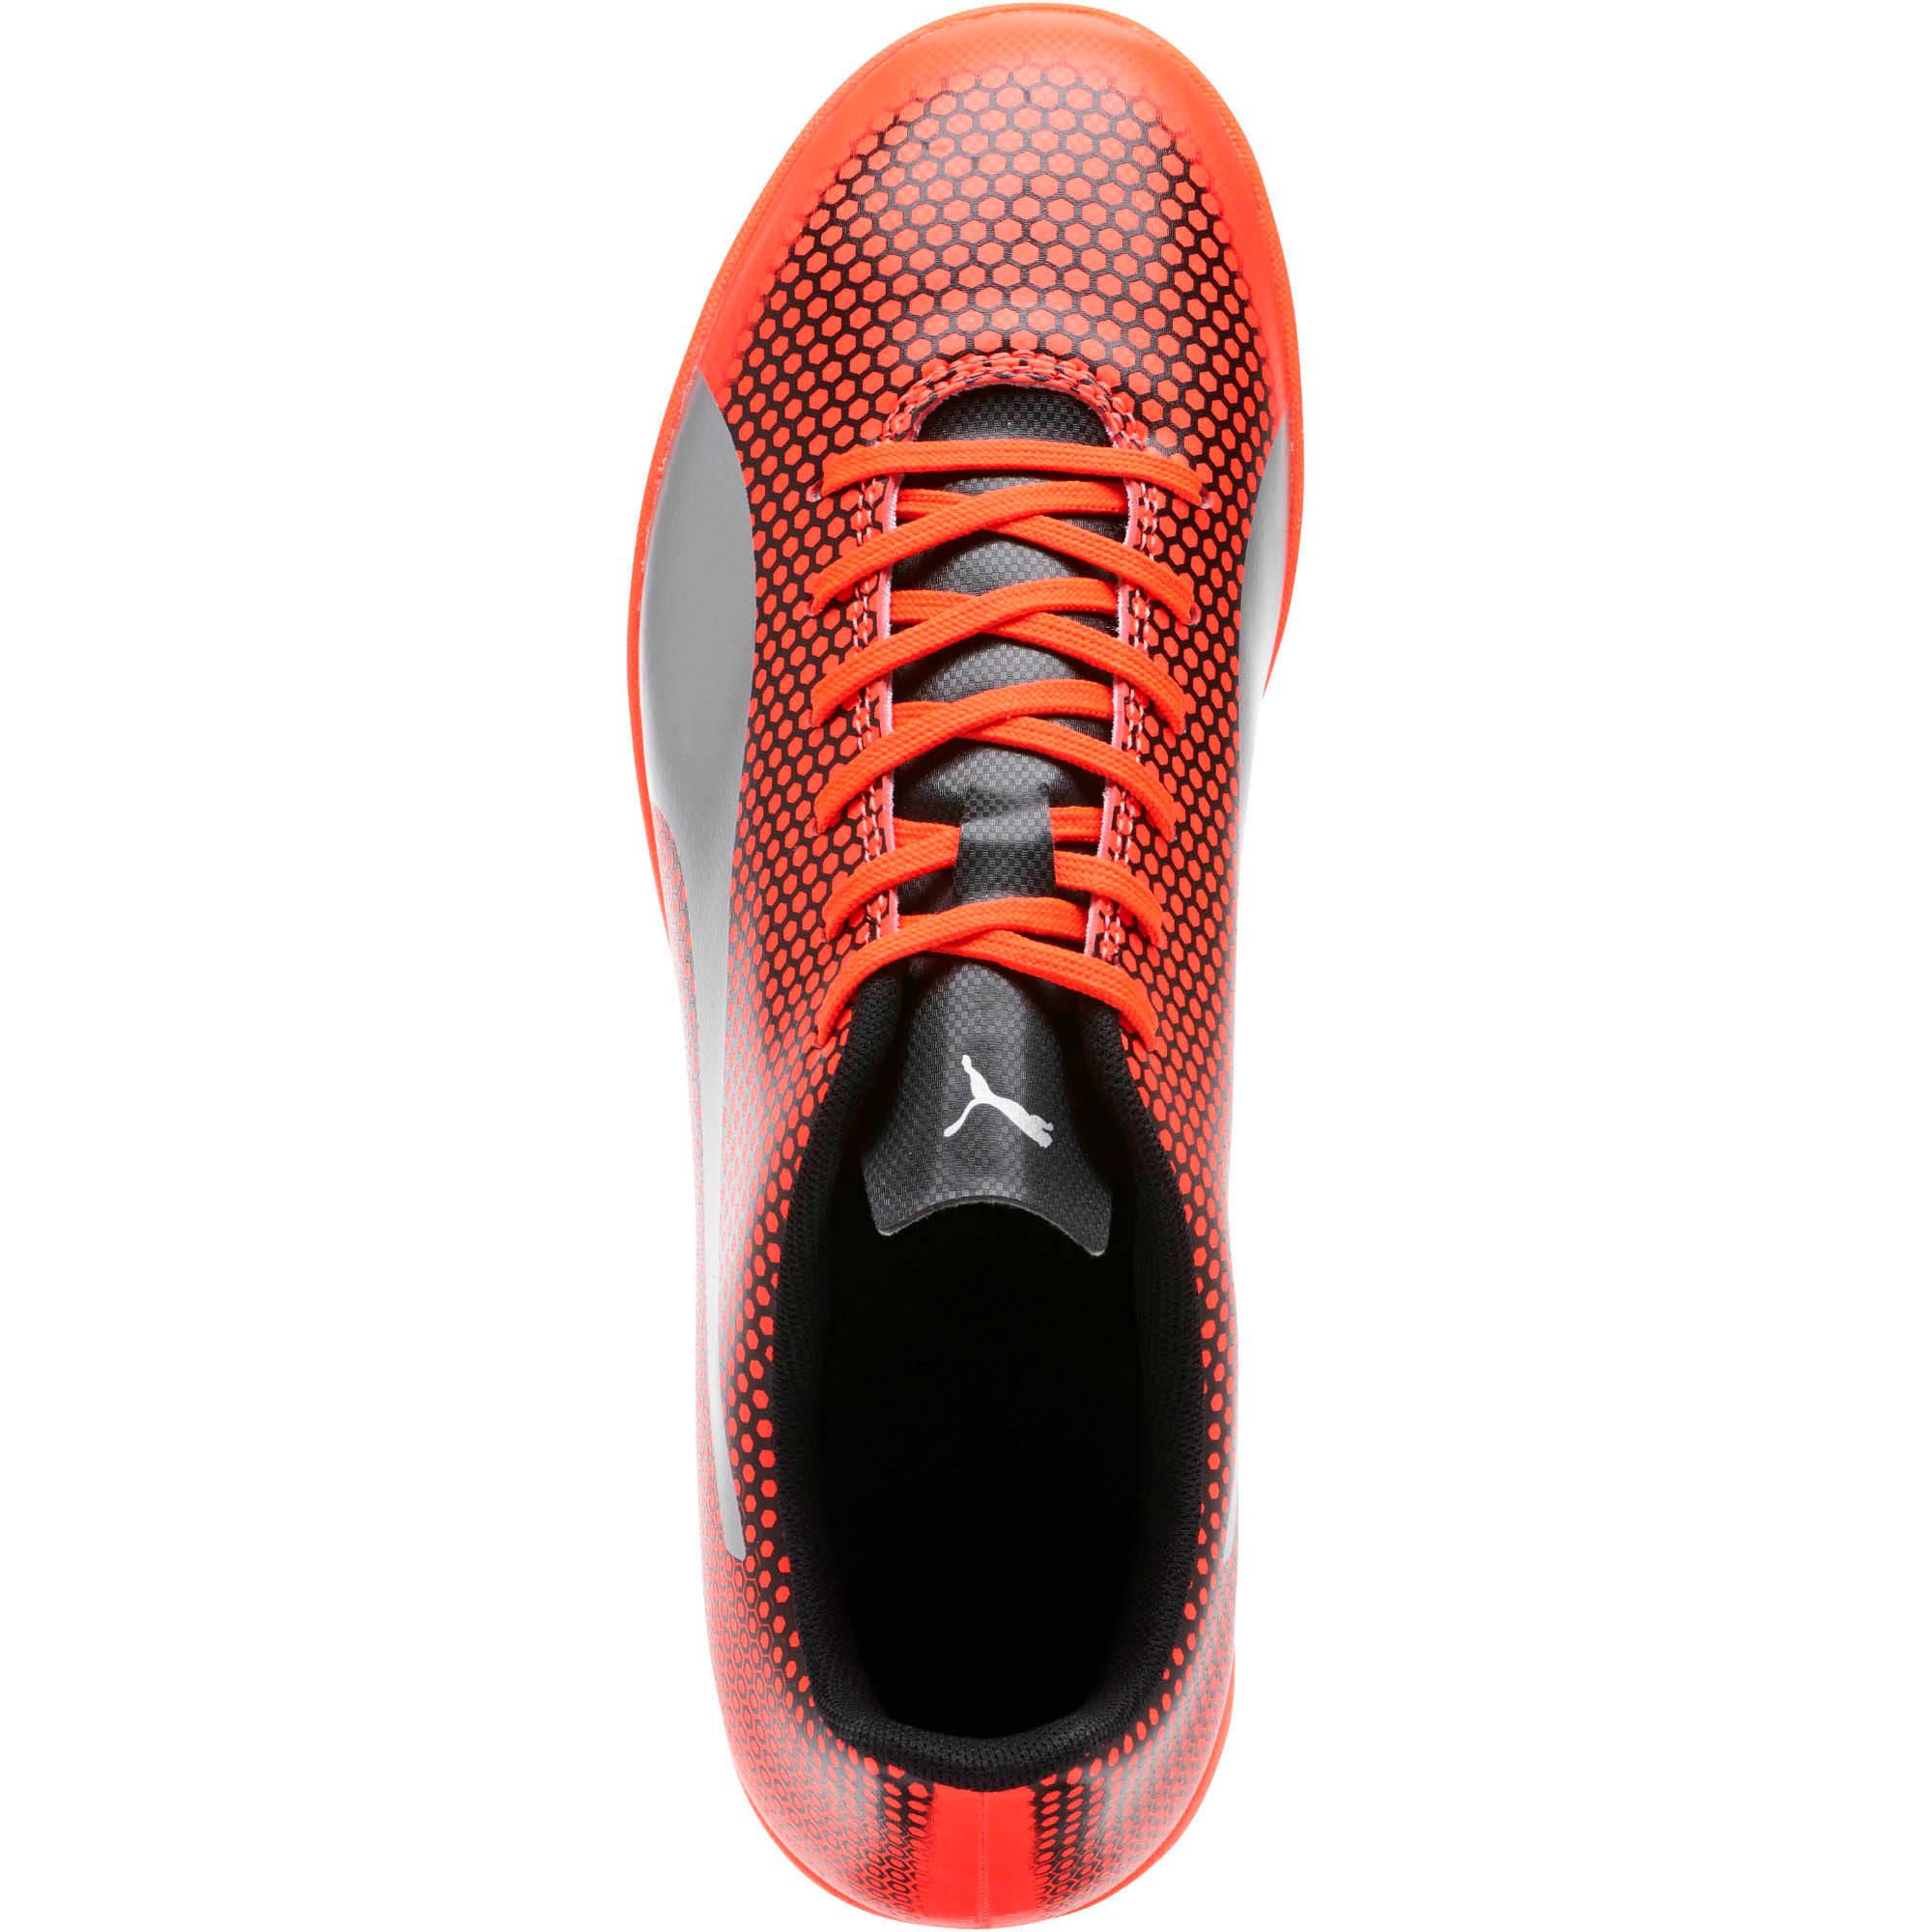 Thumbnail 5 of PUMA Spirit IT Men's Soccer Shoes, Red-Silver-Black, medium